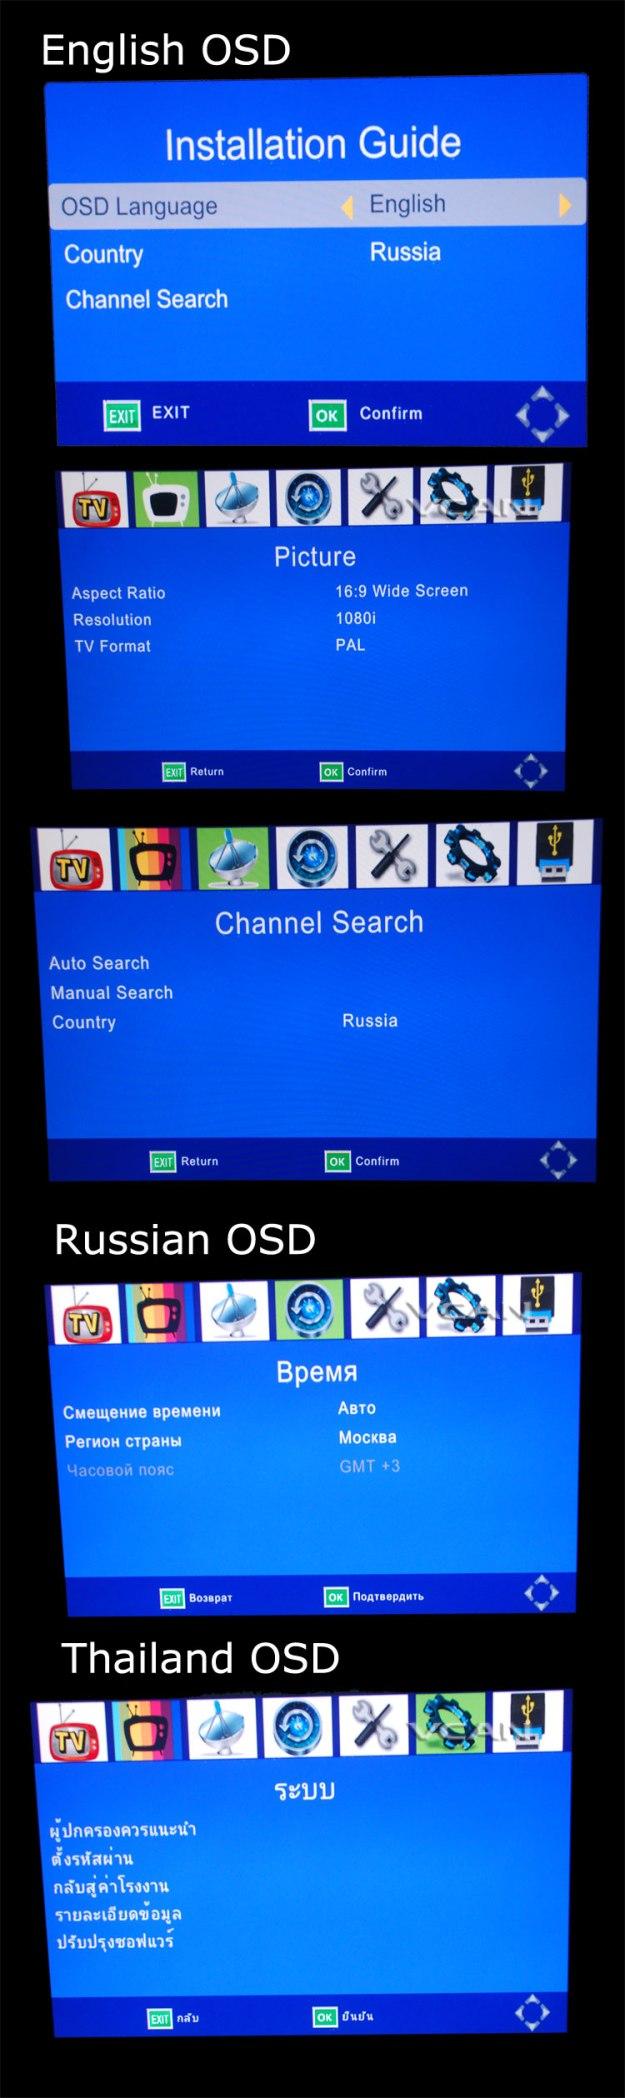 dvb-t22-2x2-2-tuner-antenna-car-dvb-t2-diversity-high-speed-russia-thailand-6